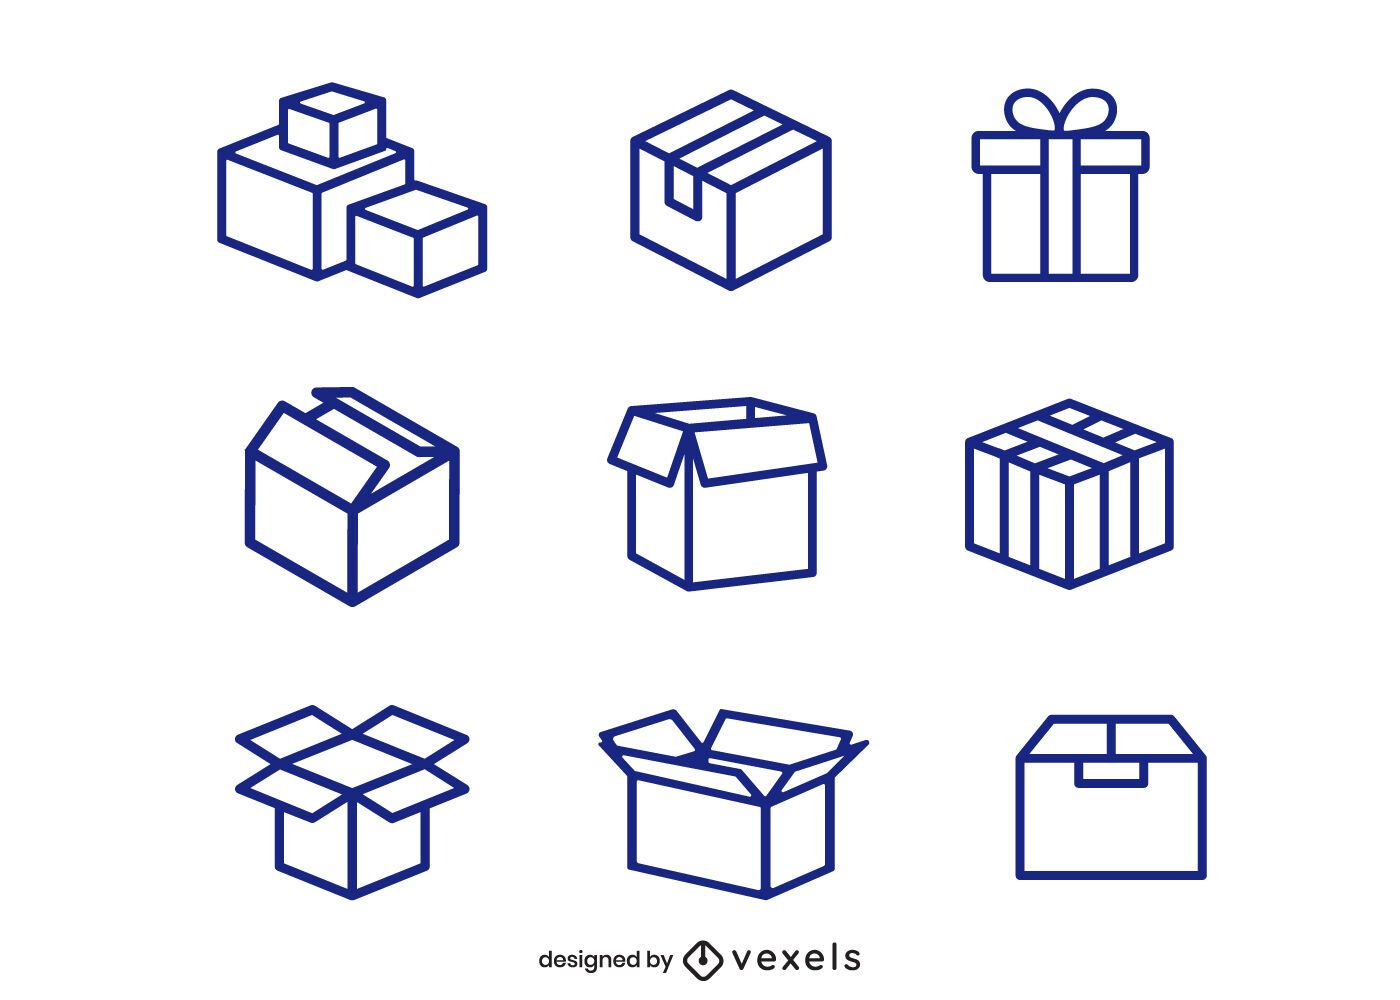 Cardboard box icon set